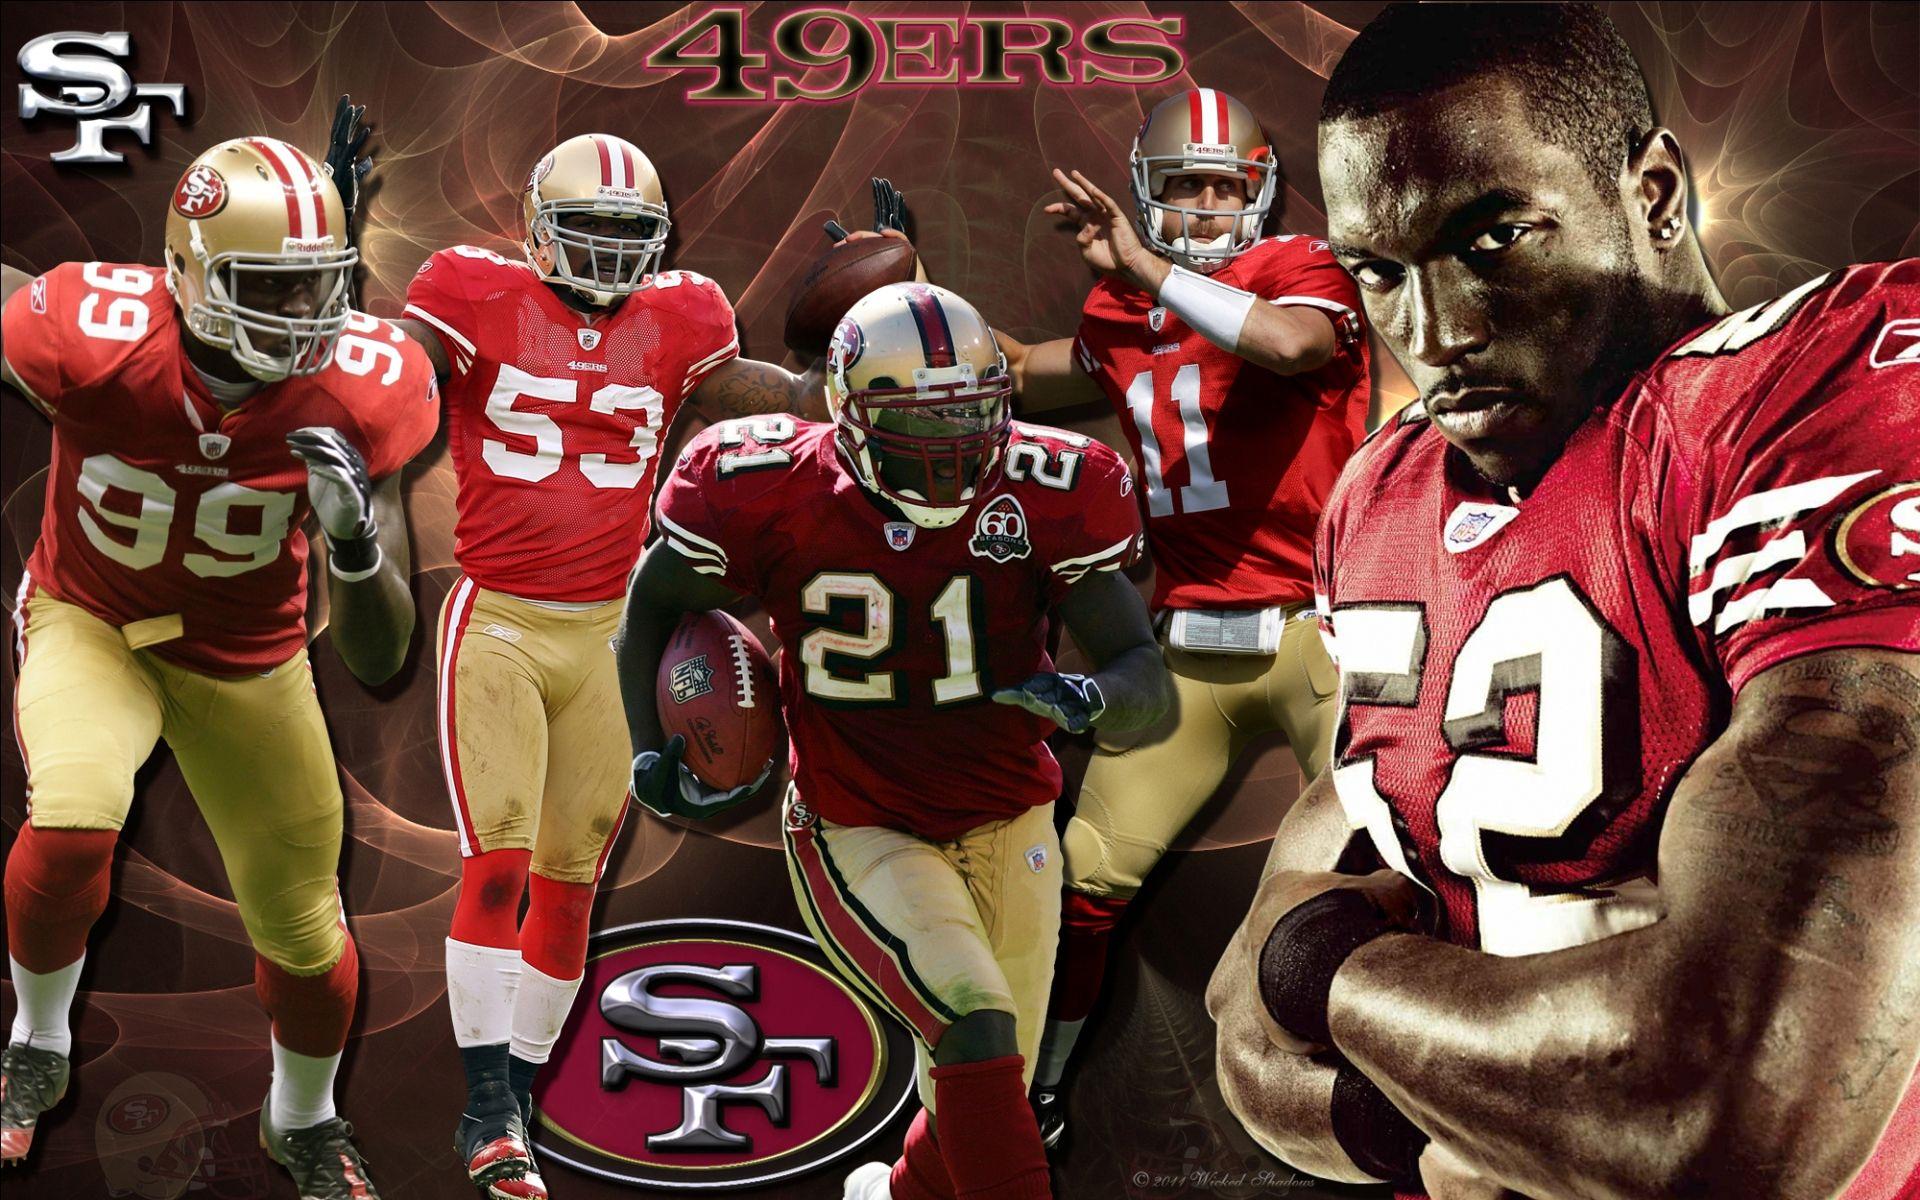 San-Francisco-ers-Best-wallpaper-wp5809264-1